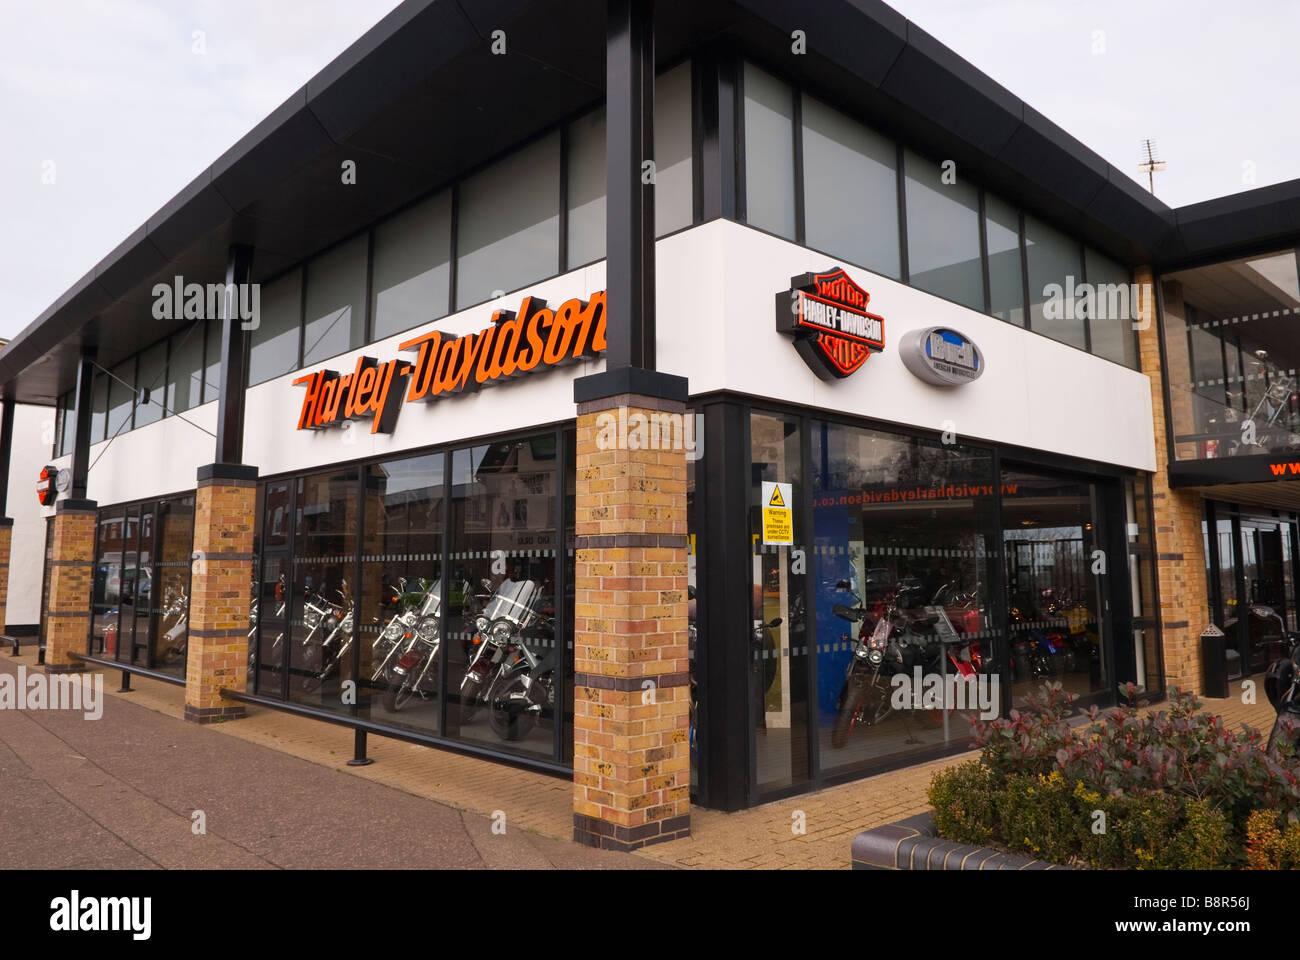 Harley Davidson Motor Cycles Motorbike Shop Store Selling